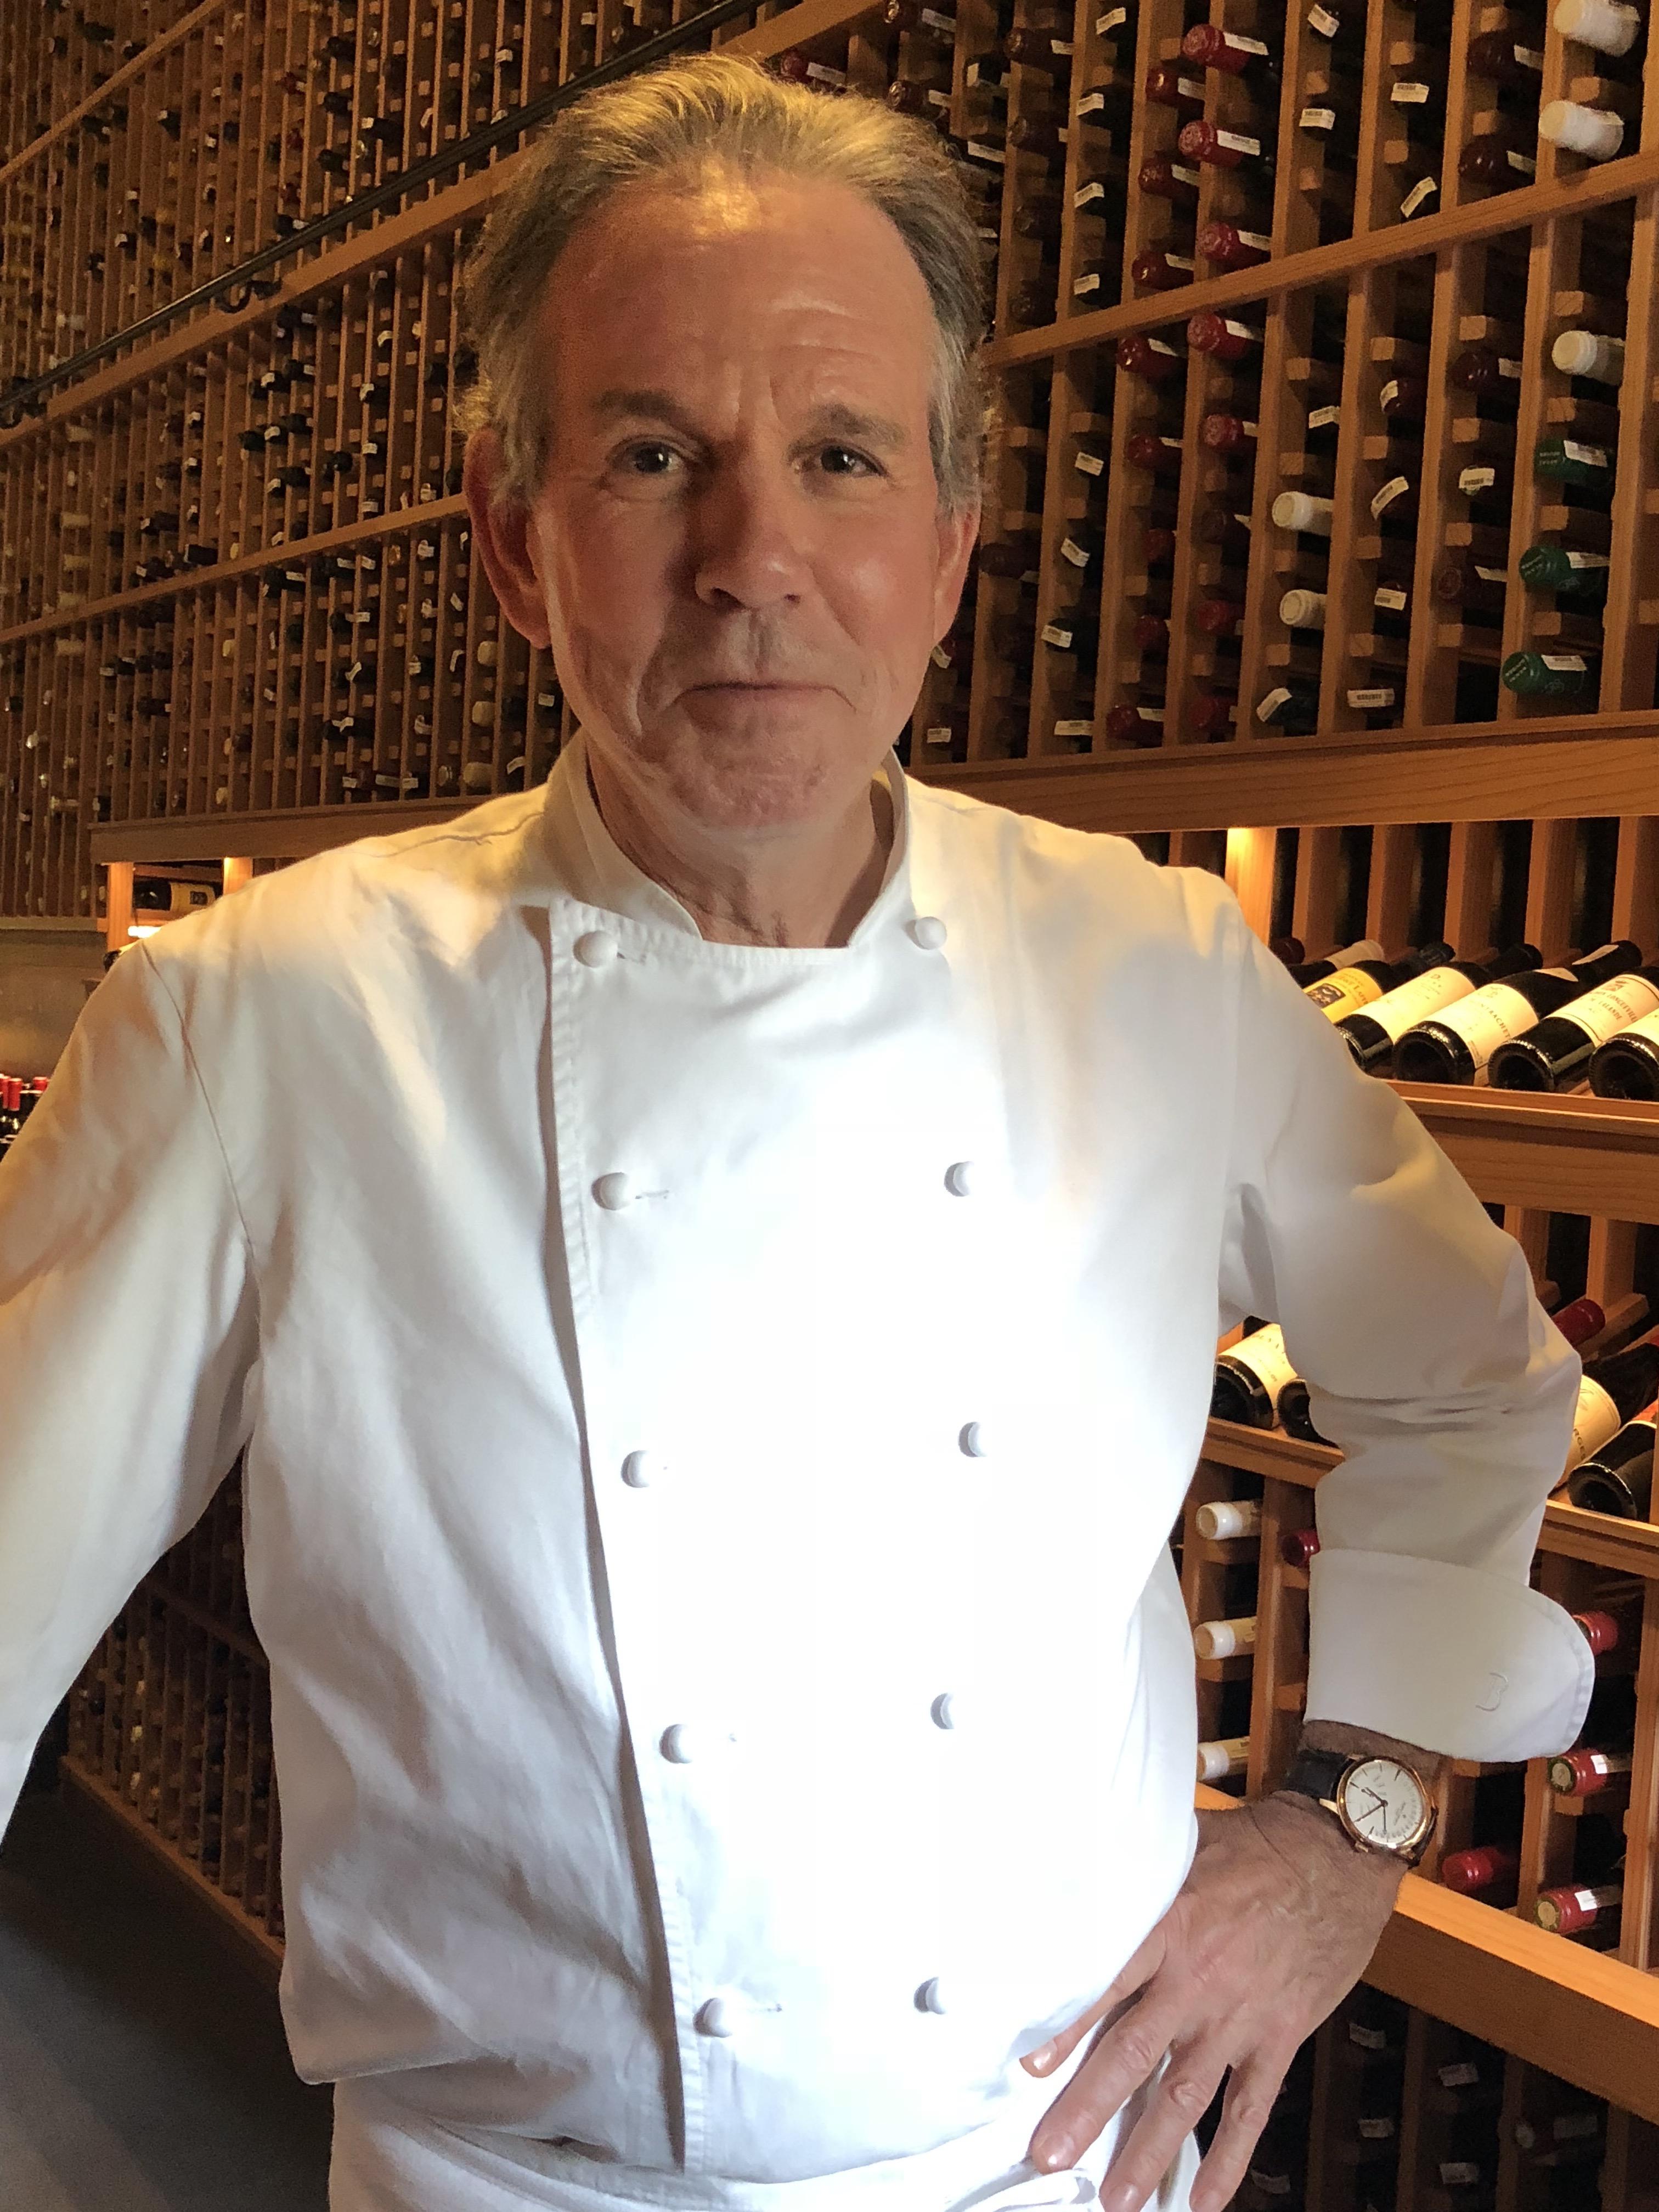 Chef Thomas Keller wears Vacheron Constantin